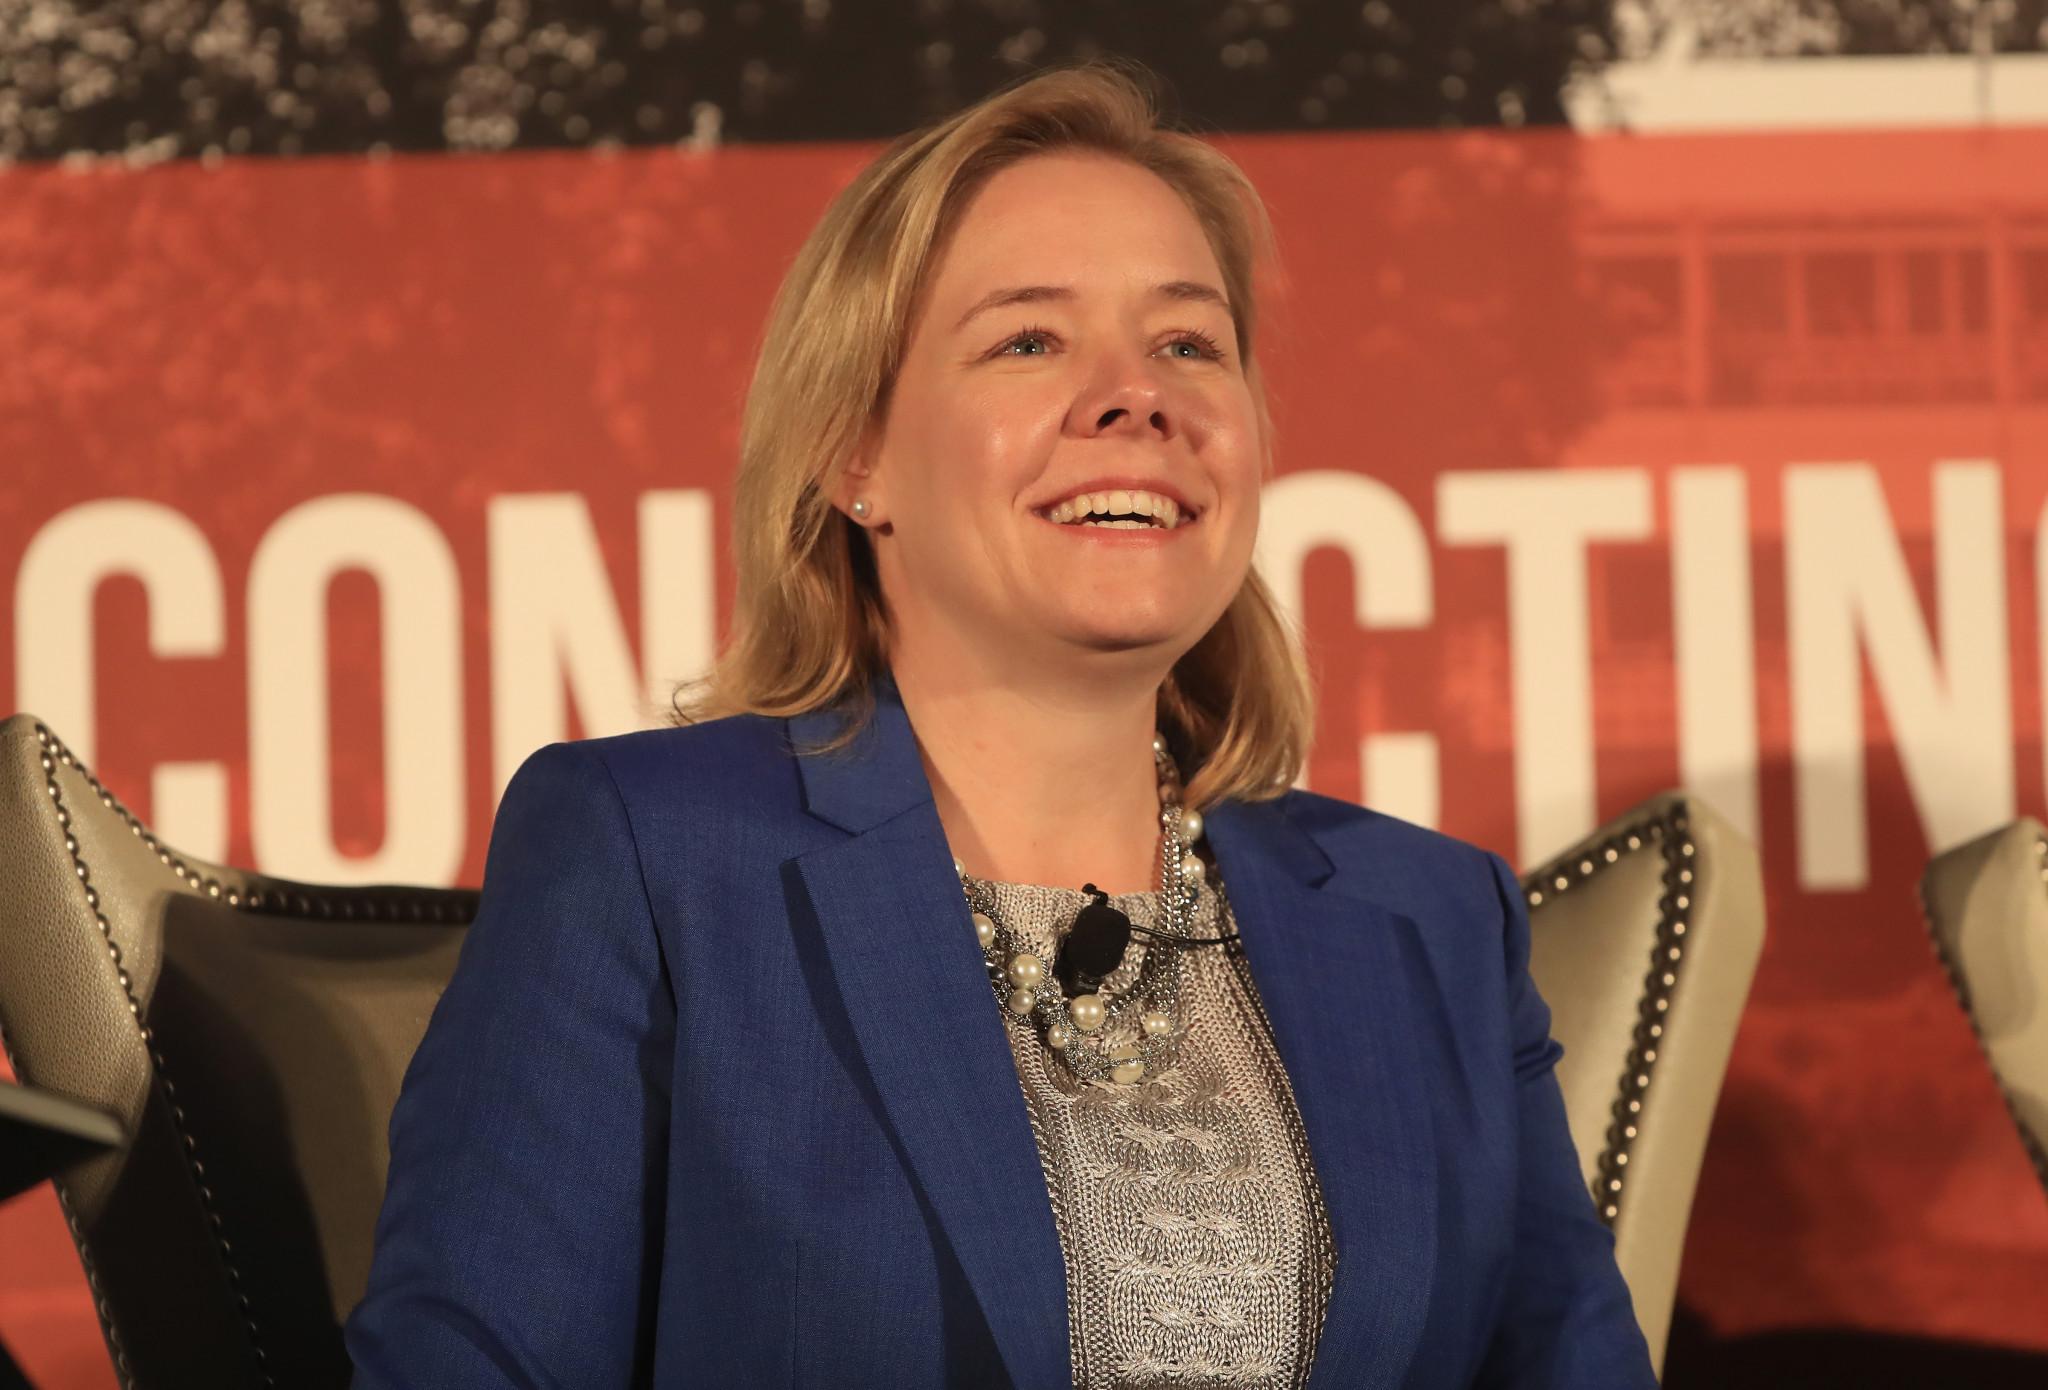 USOC chief executive Sarah Hirshland said Kirsty Carter's vision will be a